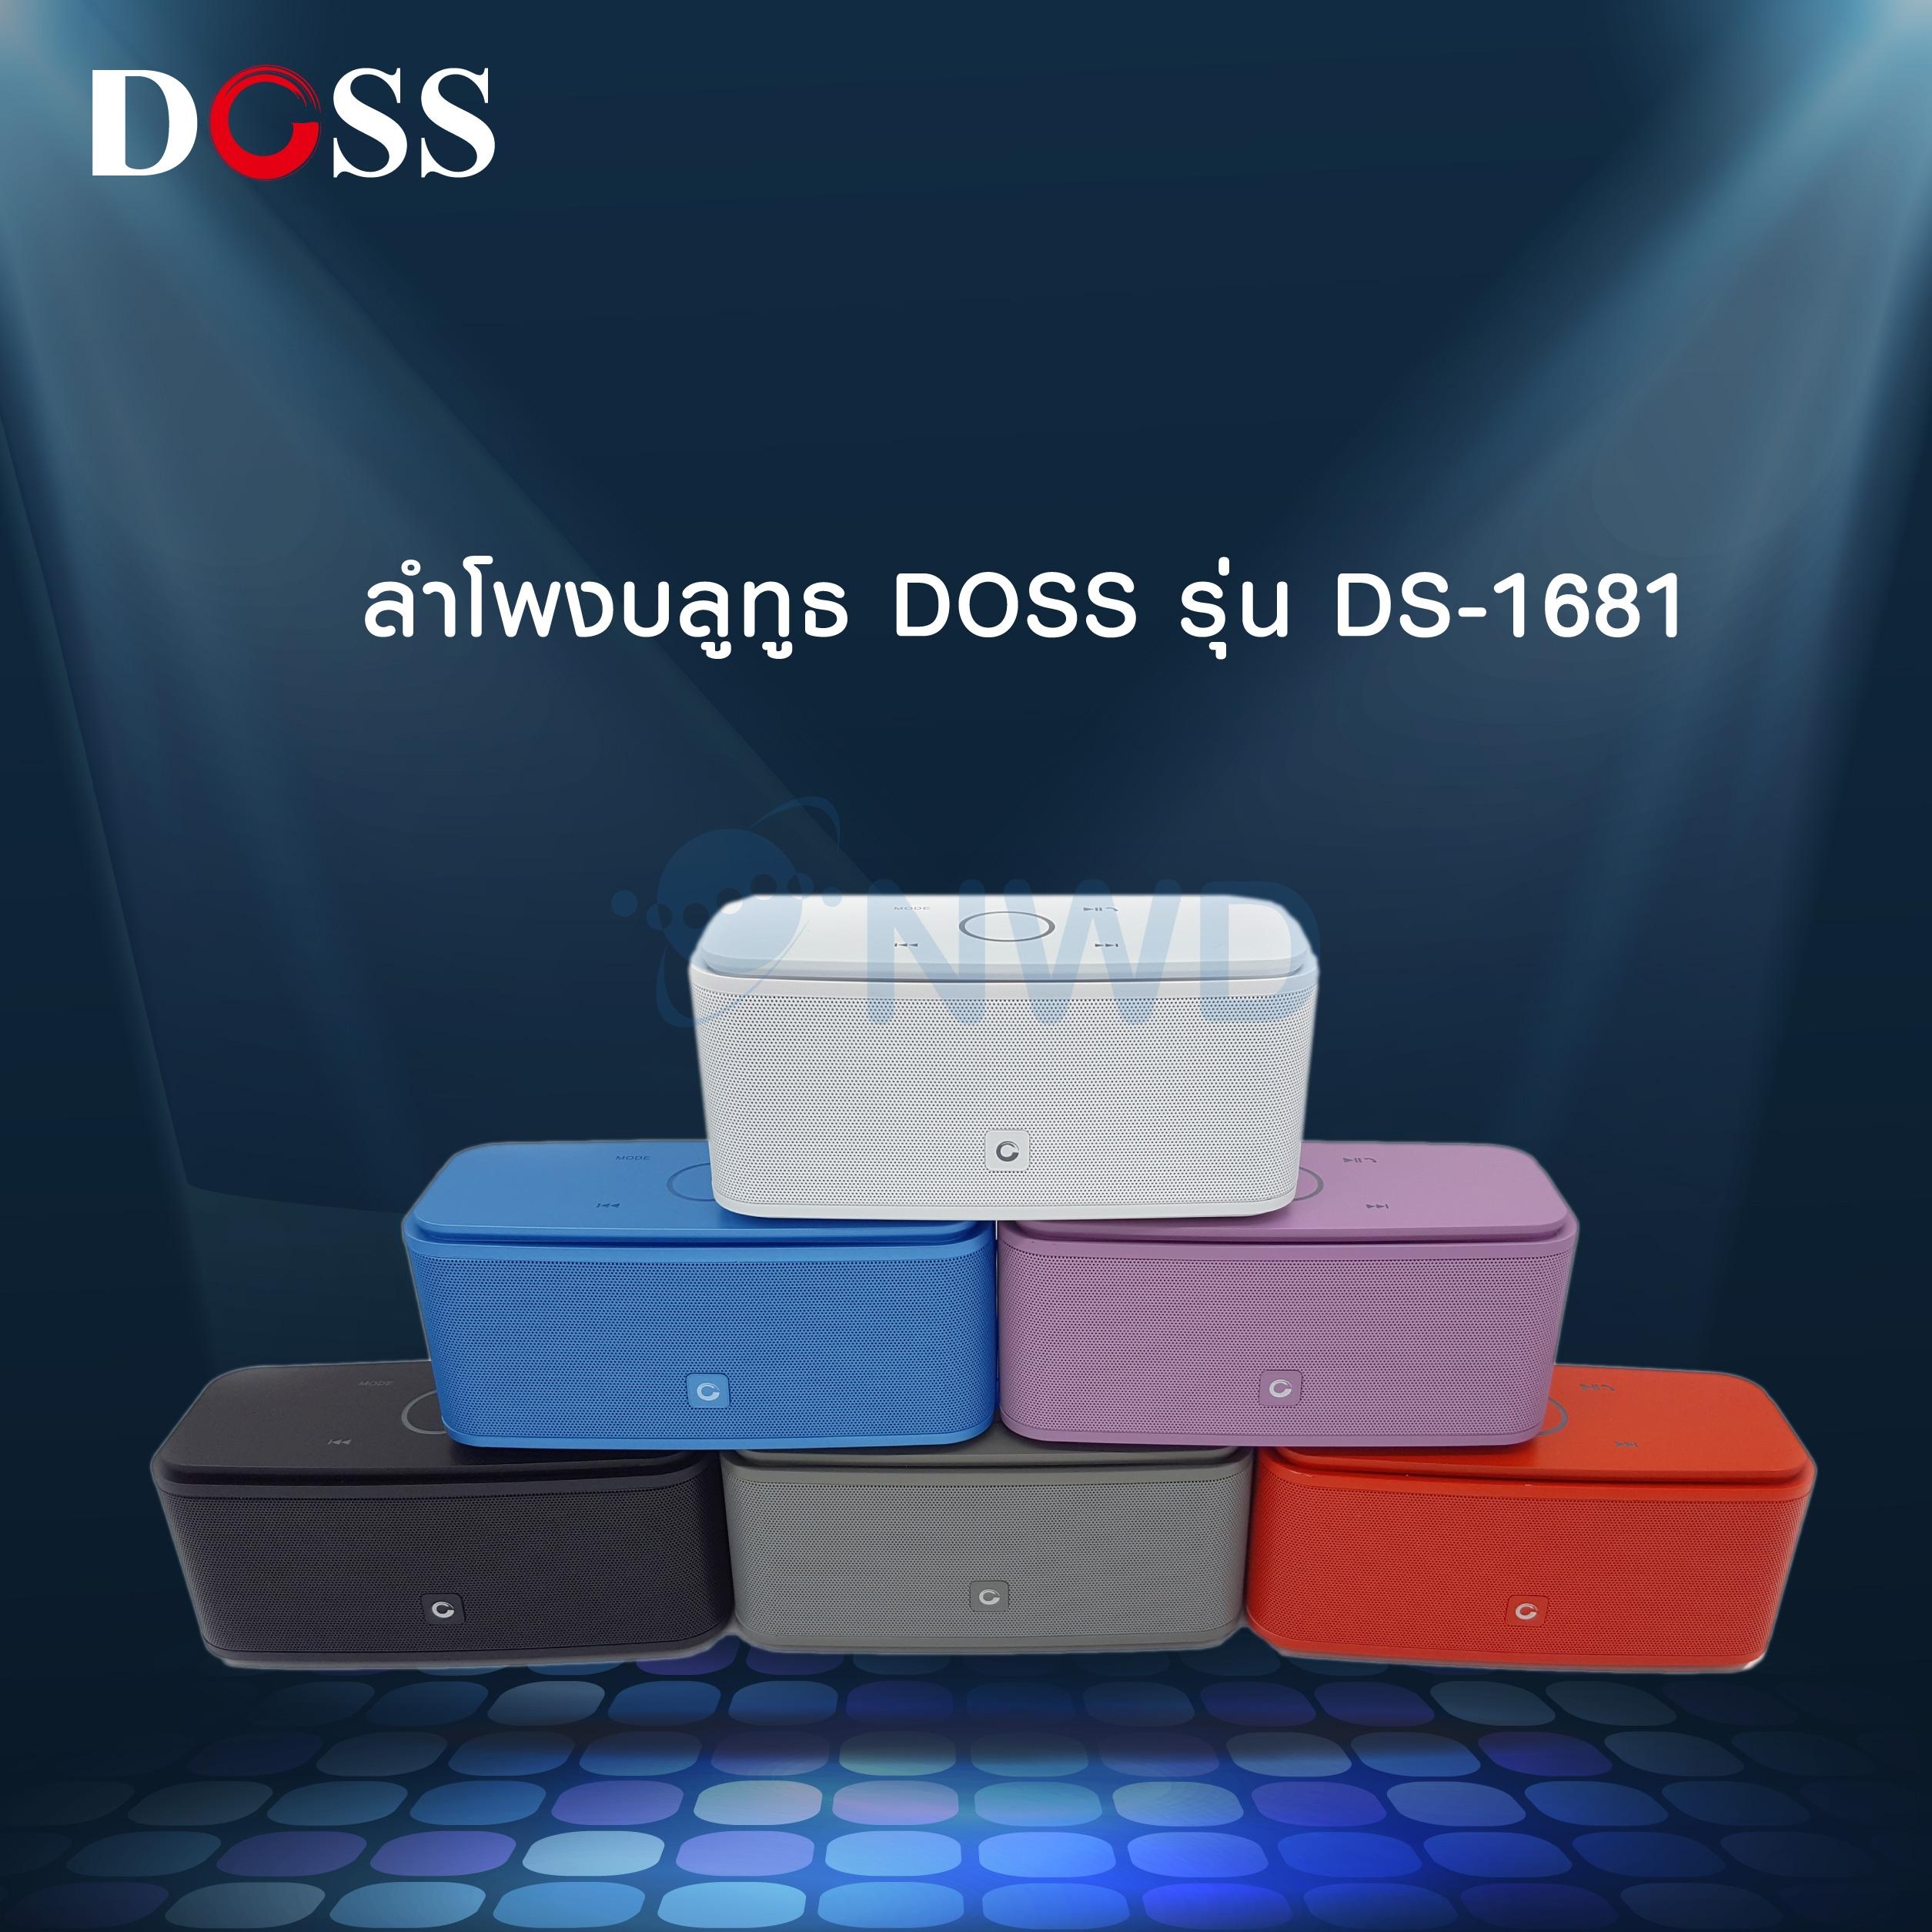 DS-1681